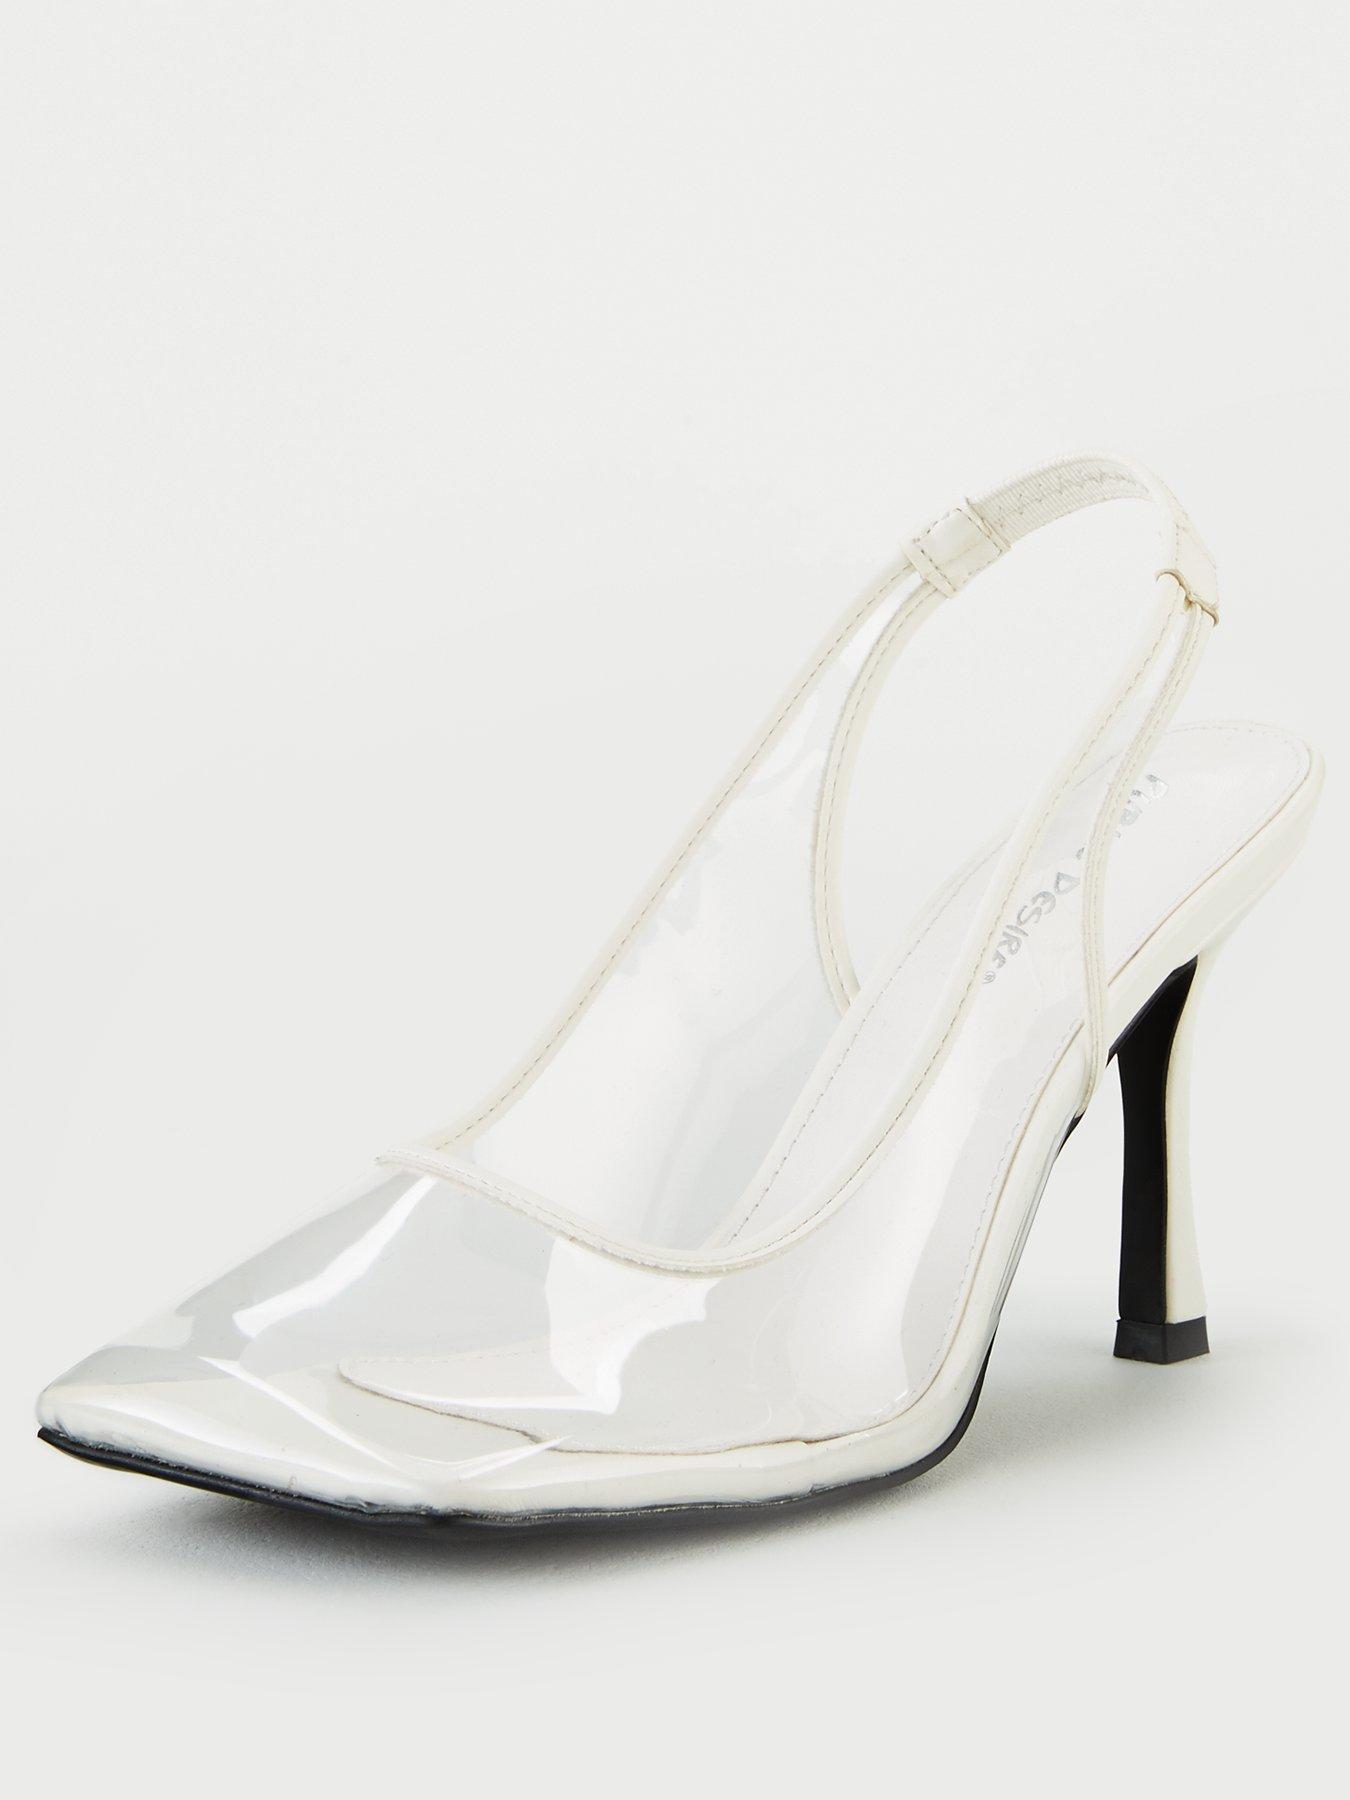 White | Heels | Shoes \u0026 boots | Women